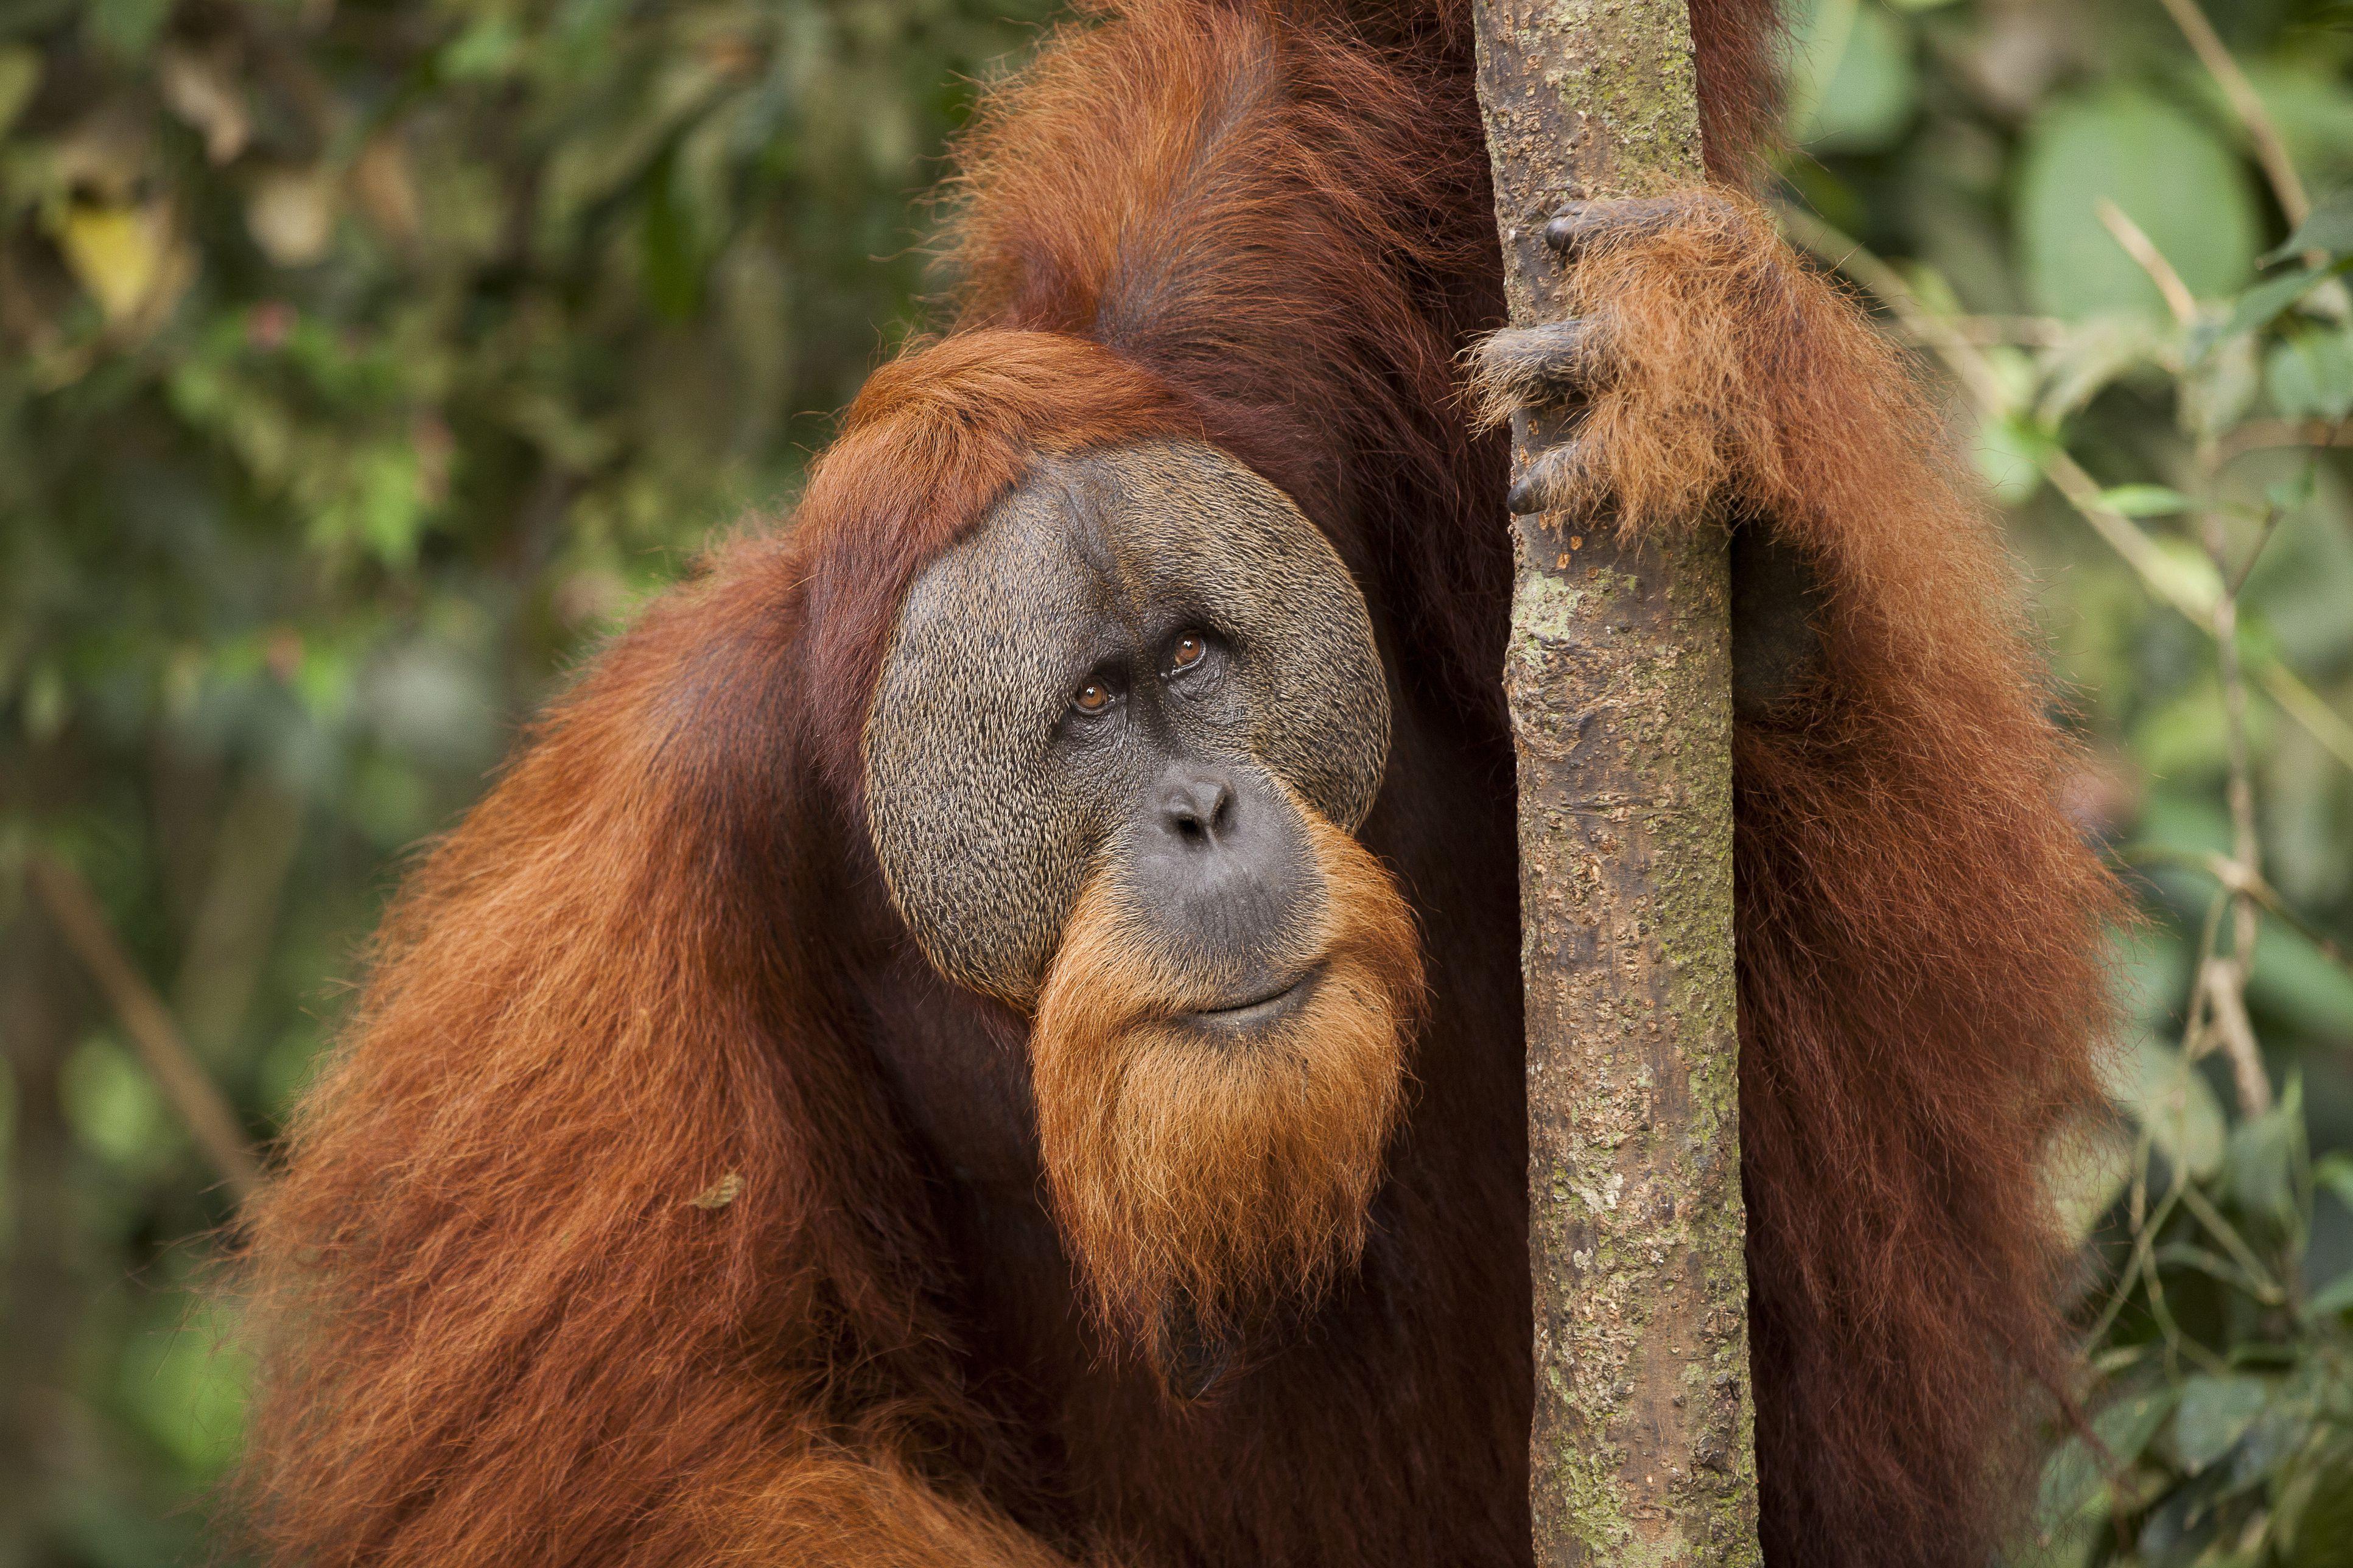 'Sumatran Orangutan (Pongo abelii) male in tree, Gunung Leuser National Park, Sumatra, Indonesia'